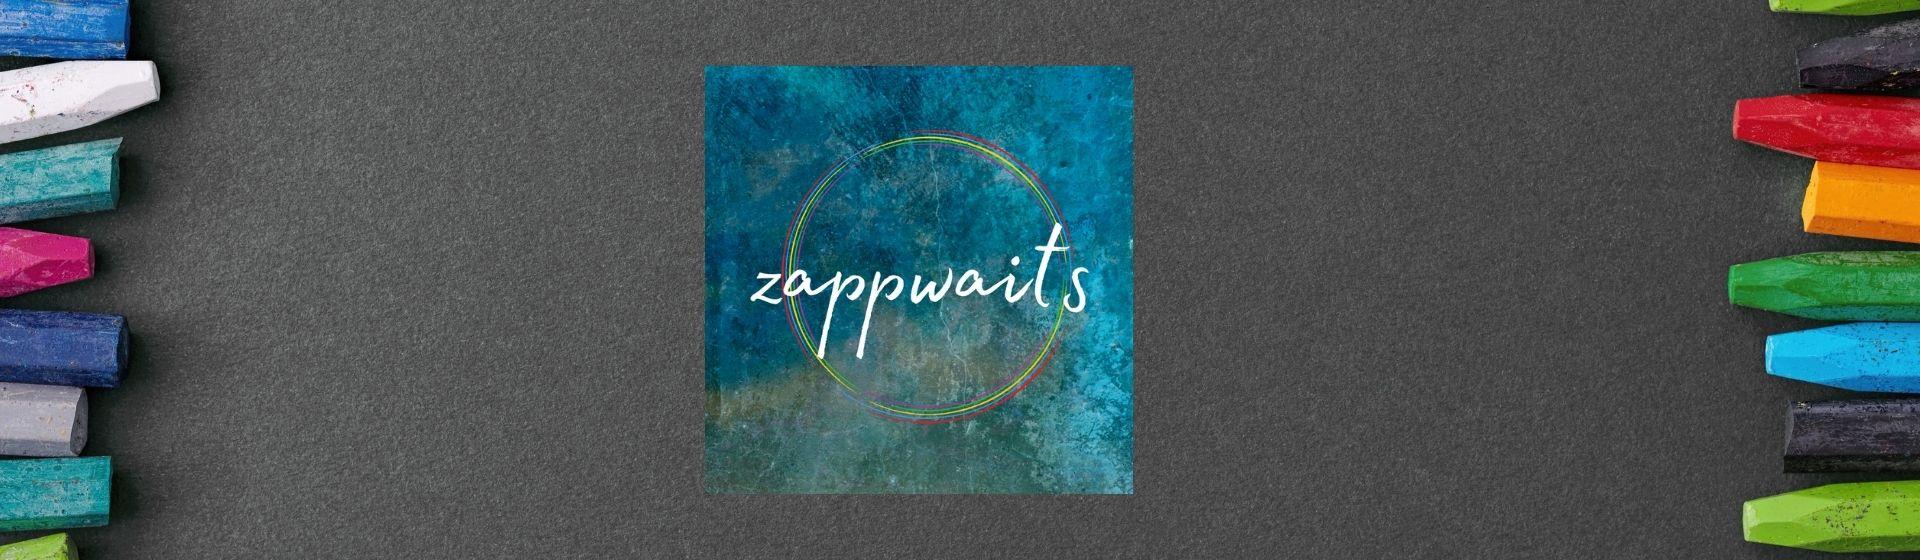 Online-Shop Zappwaits by shirtee